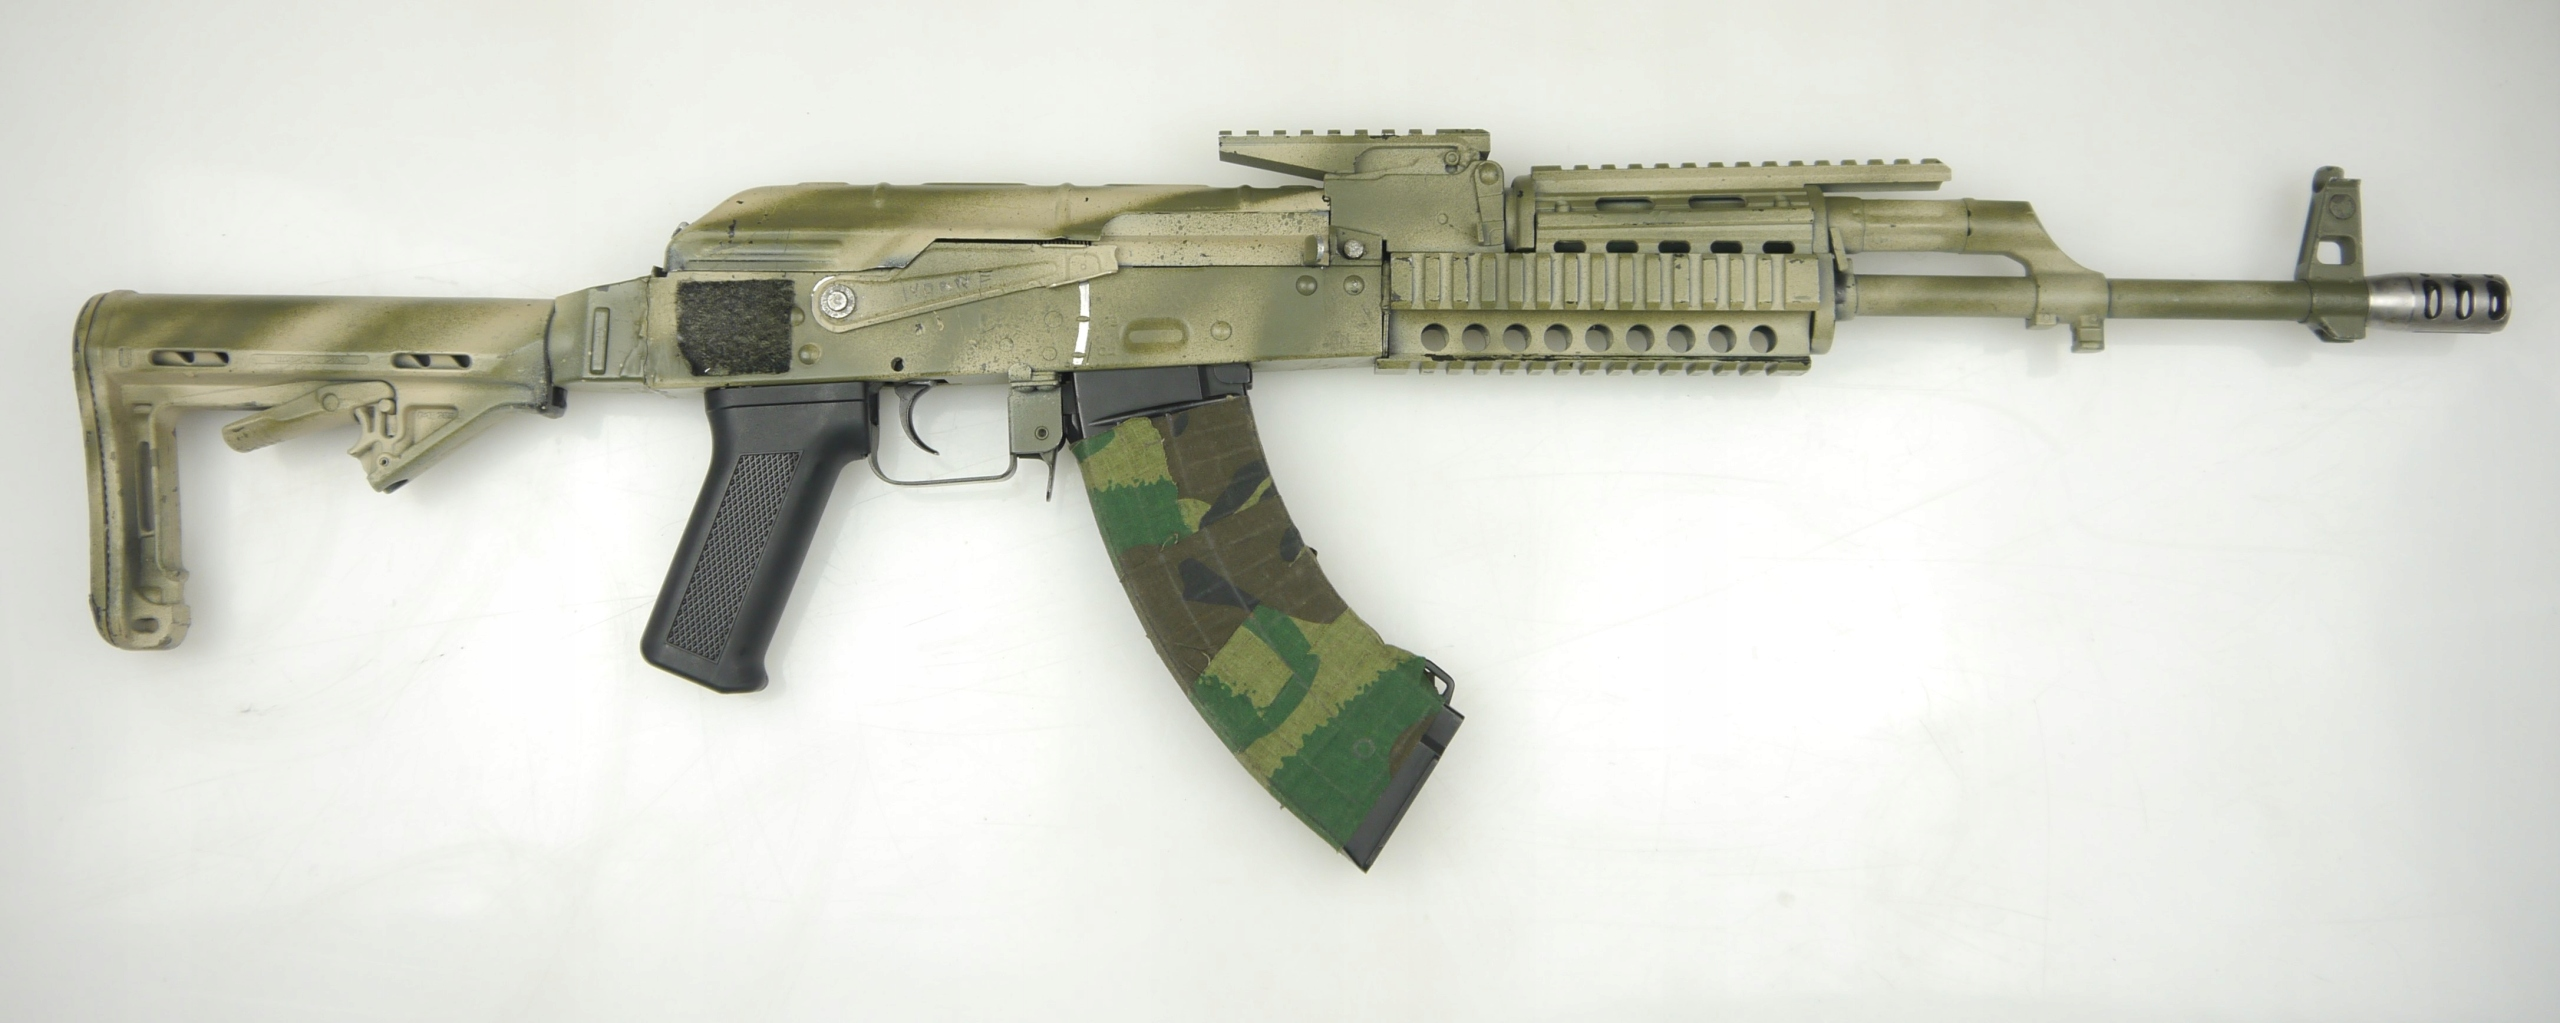 "Replika AKMS CM.048S ""TUNING"" ASG"